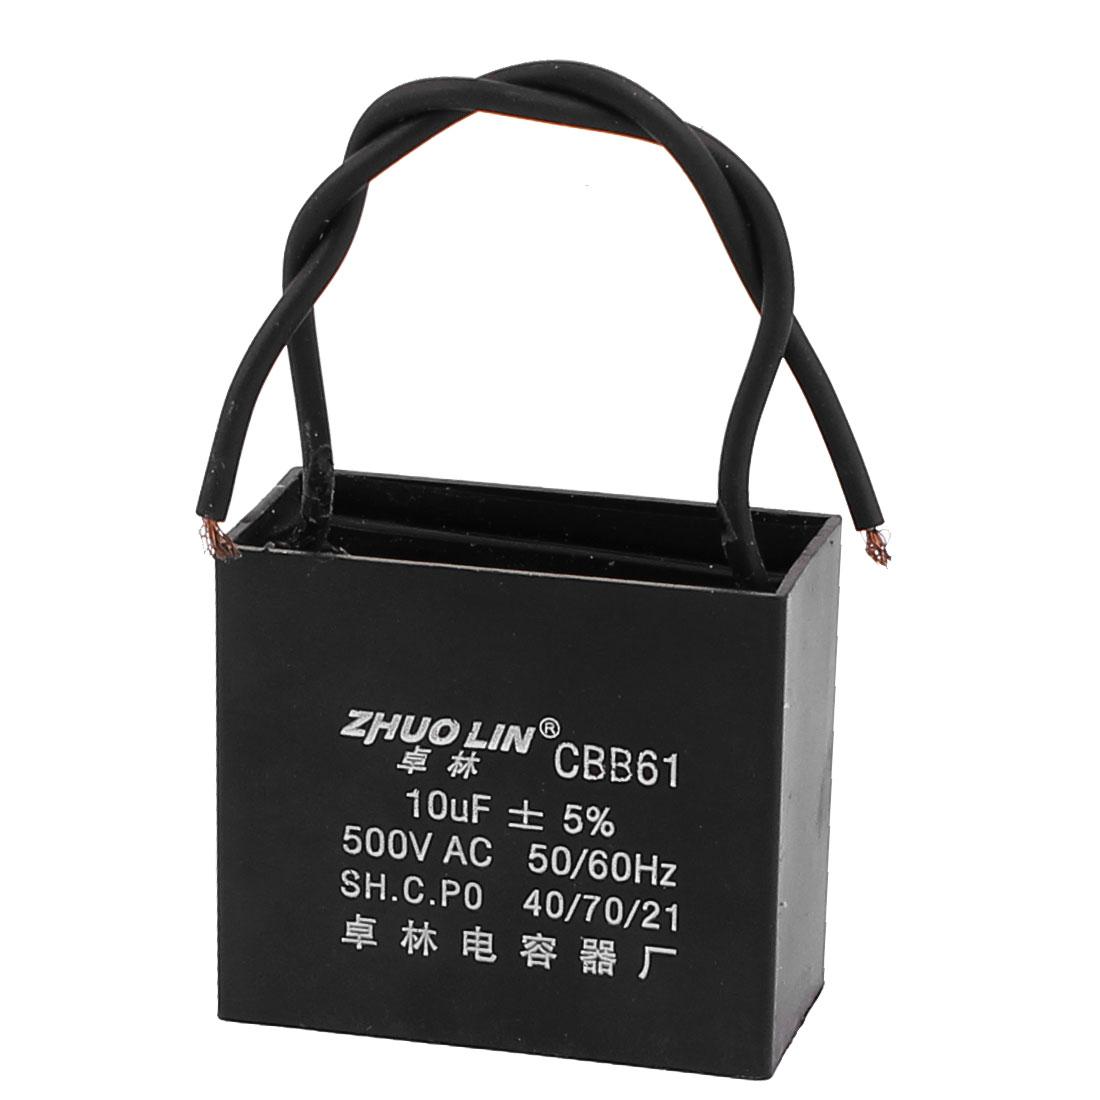 AC 500V 10uf 50/60Hz 2 Wire Lead Motor Run Fan Capacitor CBB61 Black